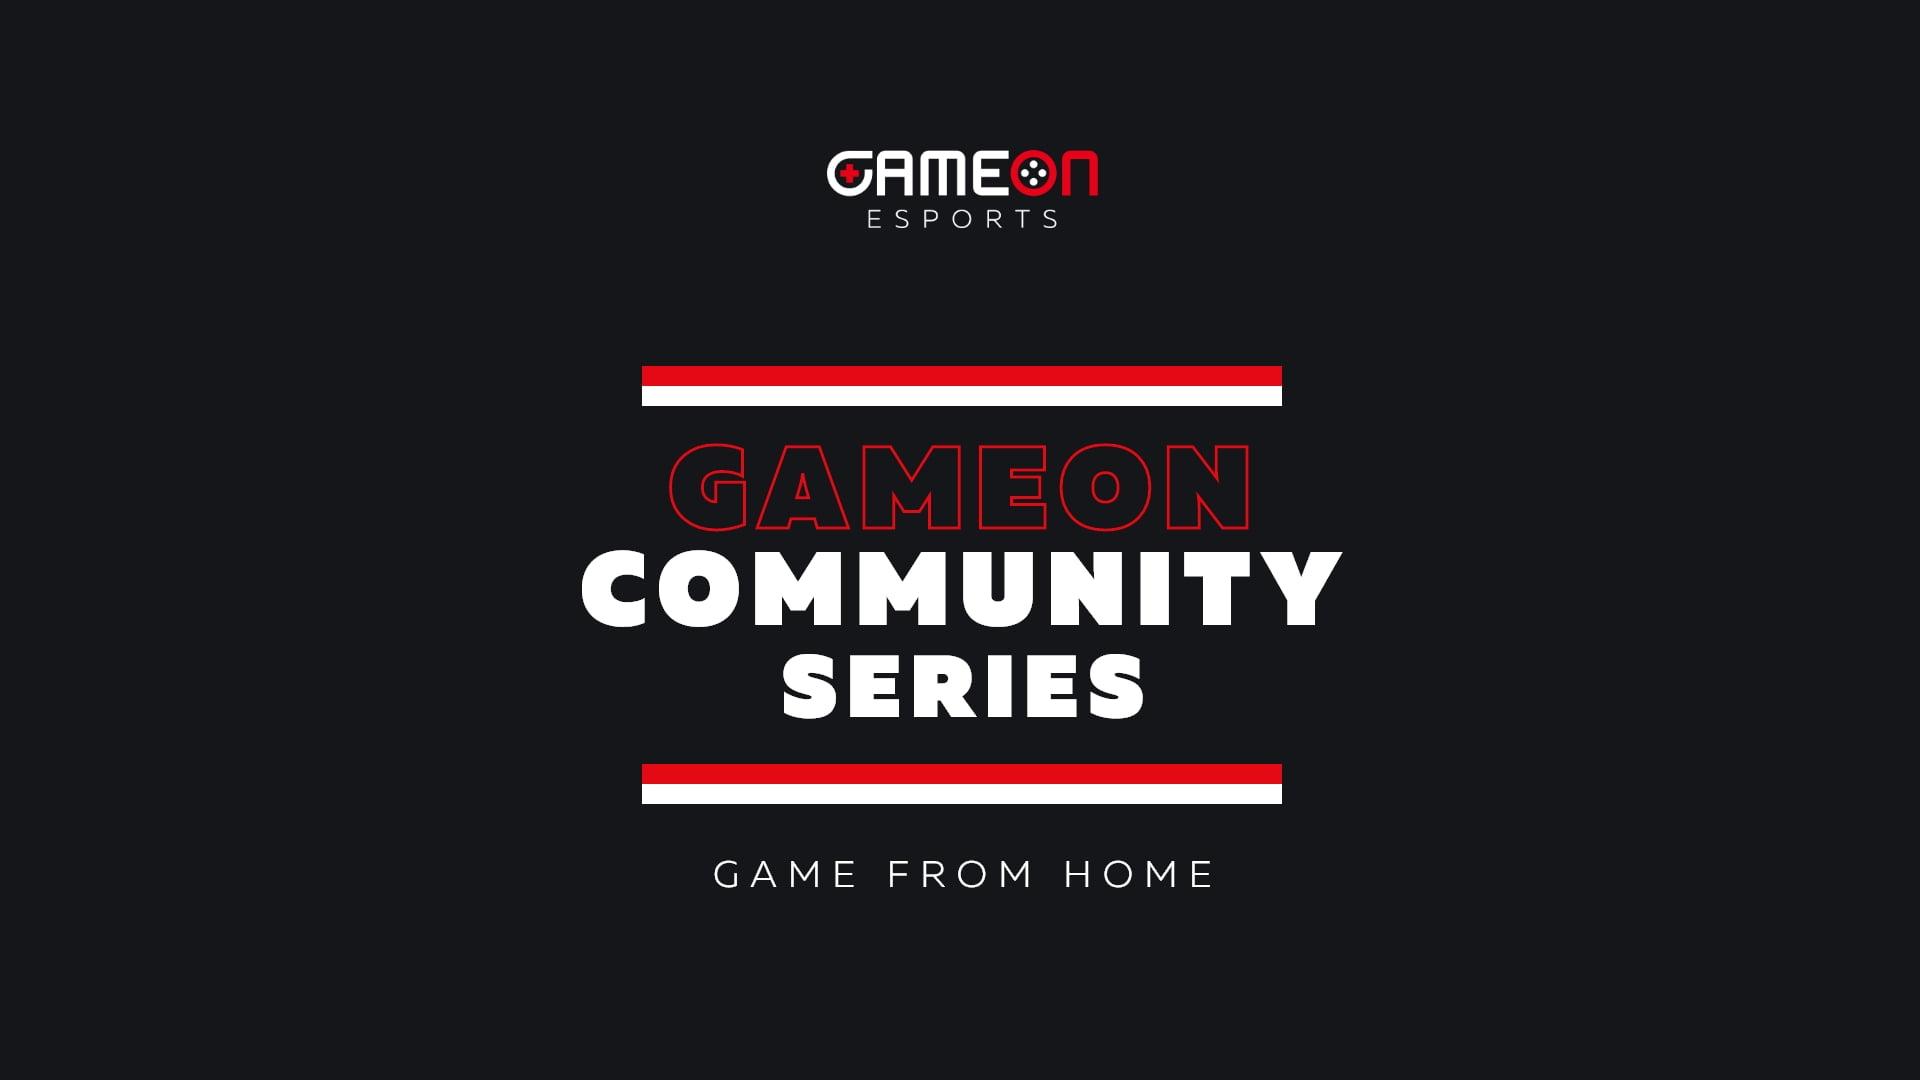 gameon community series, pubg mobile,